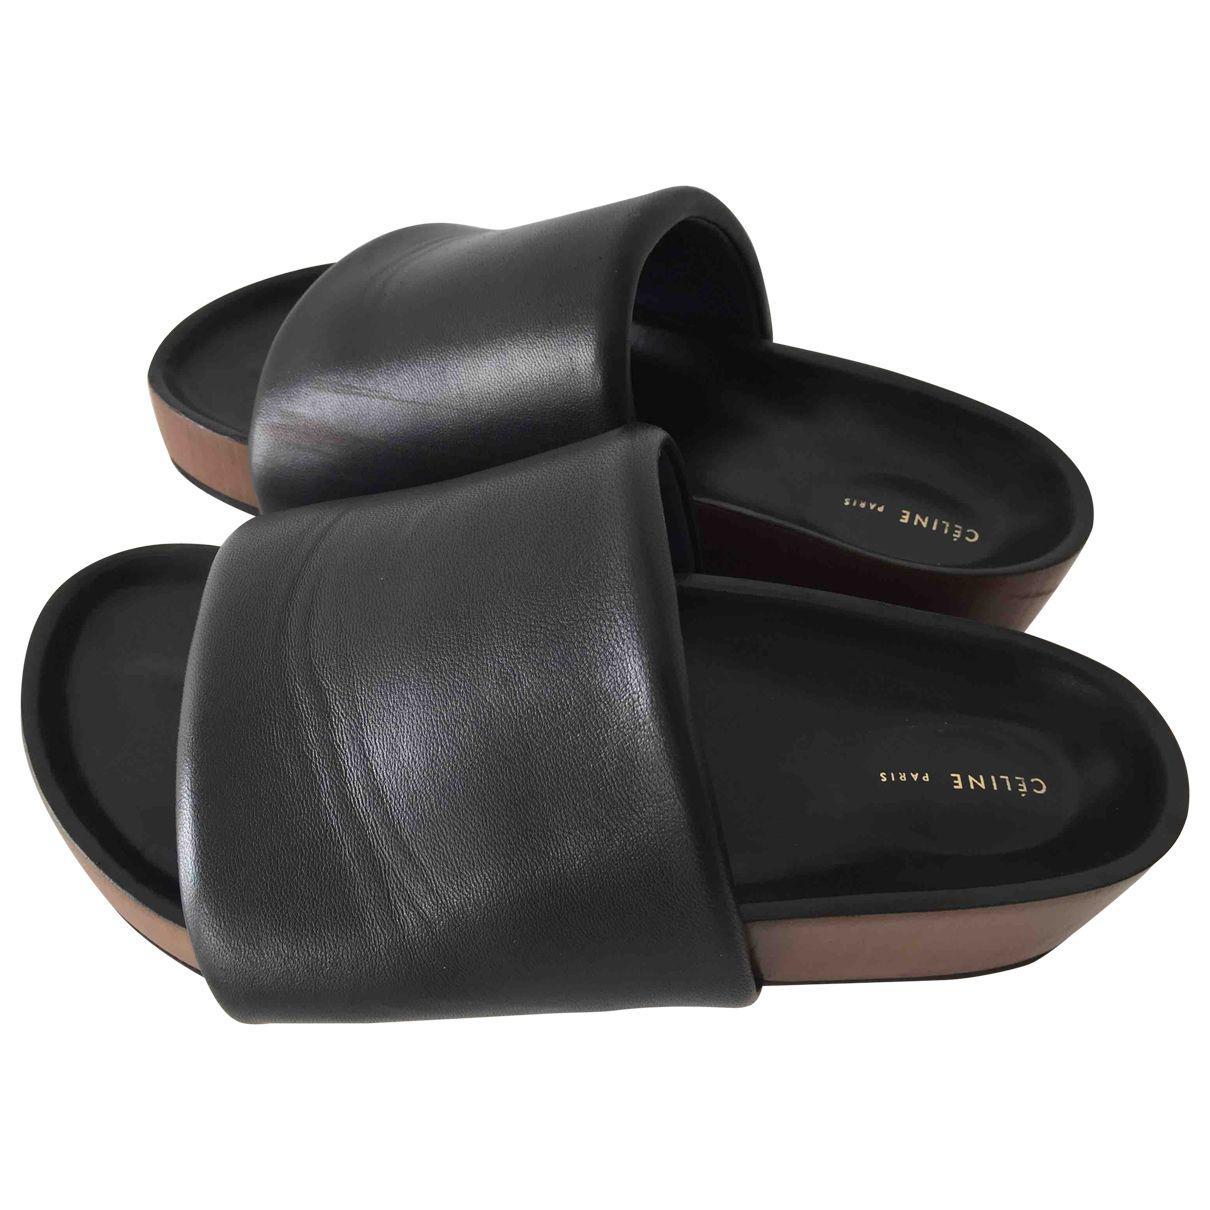 341e4b8984f Céline. Women s Black Leather Mules   Clogs. £441 From Vestiaire Collective